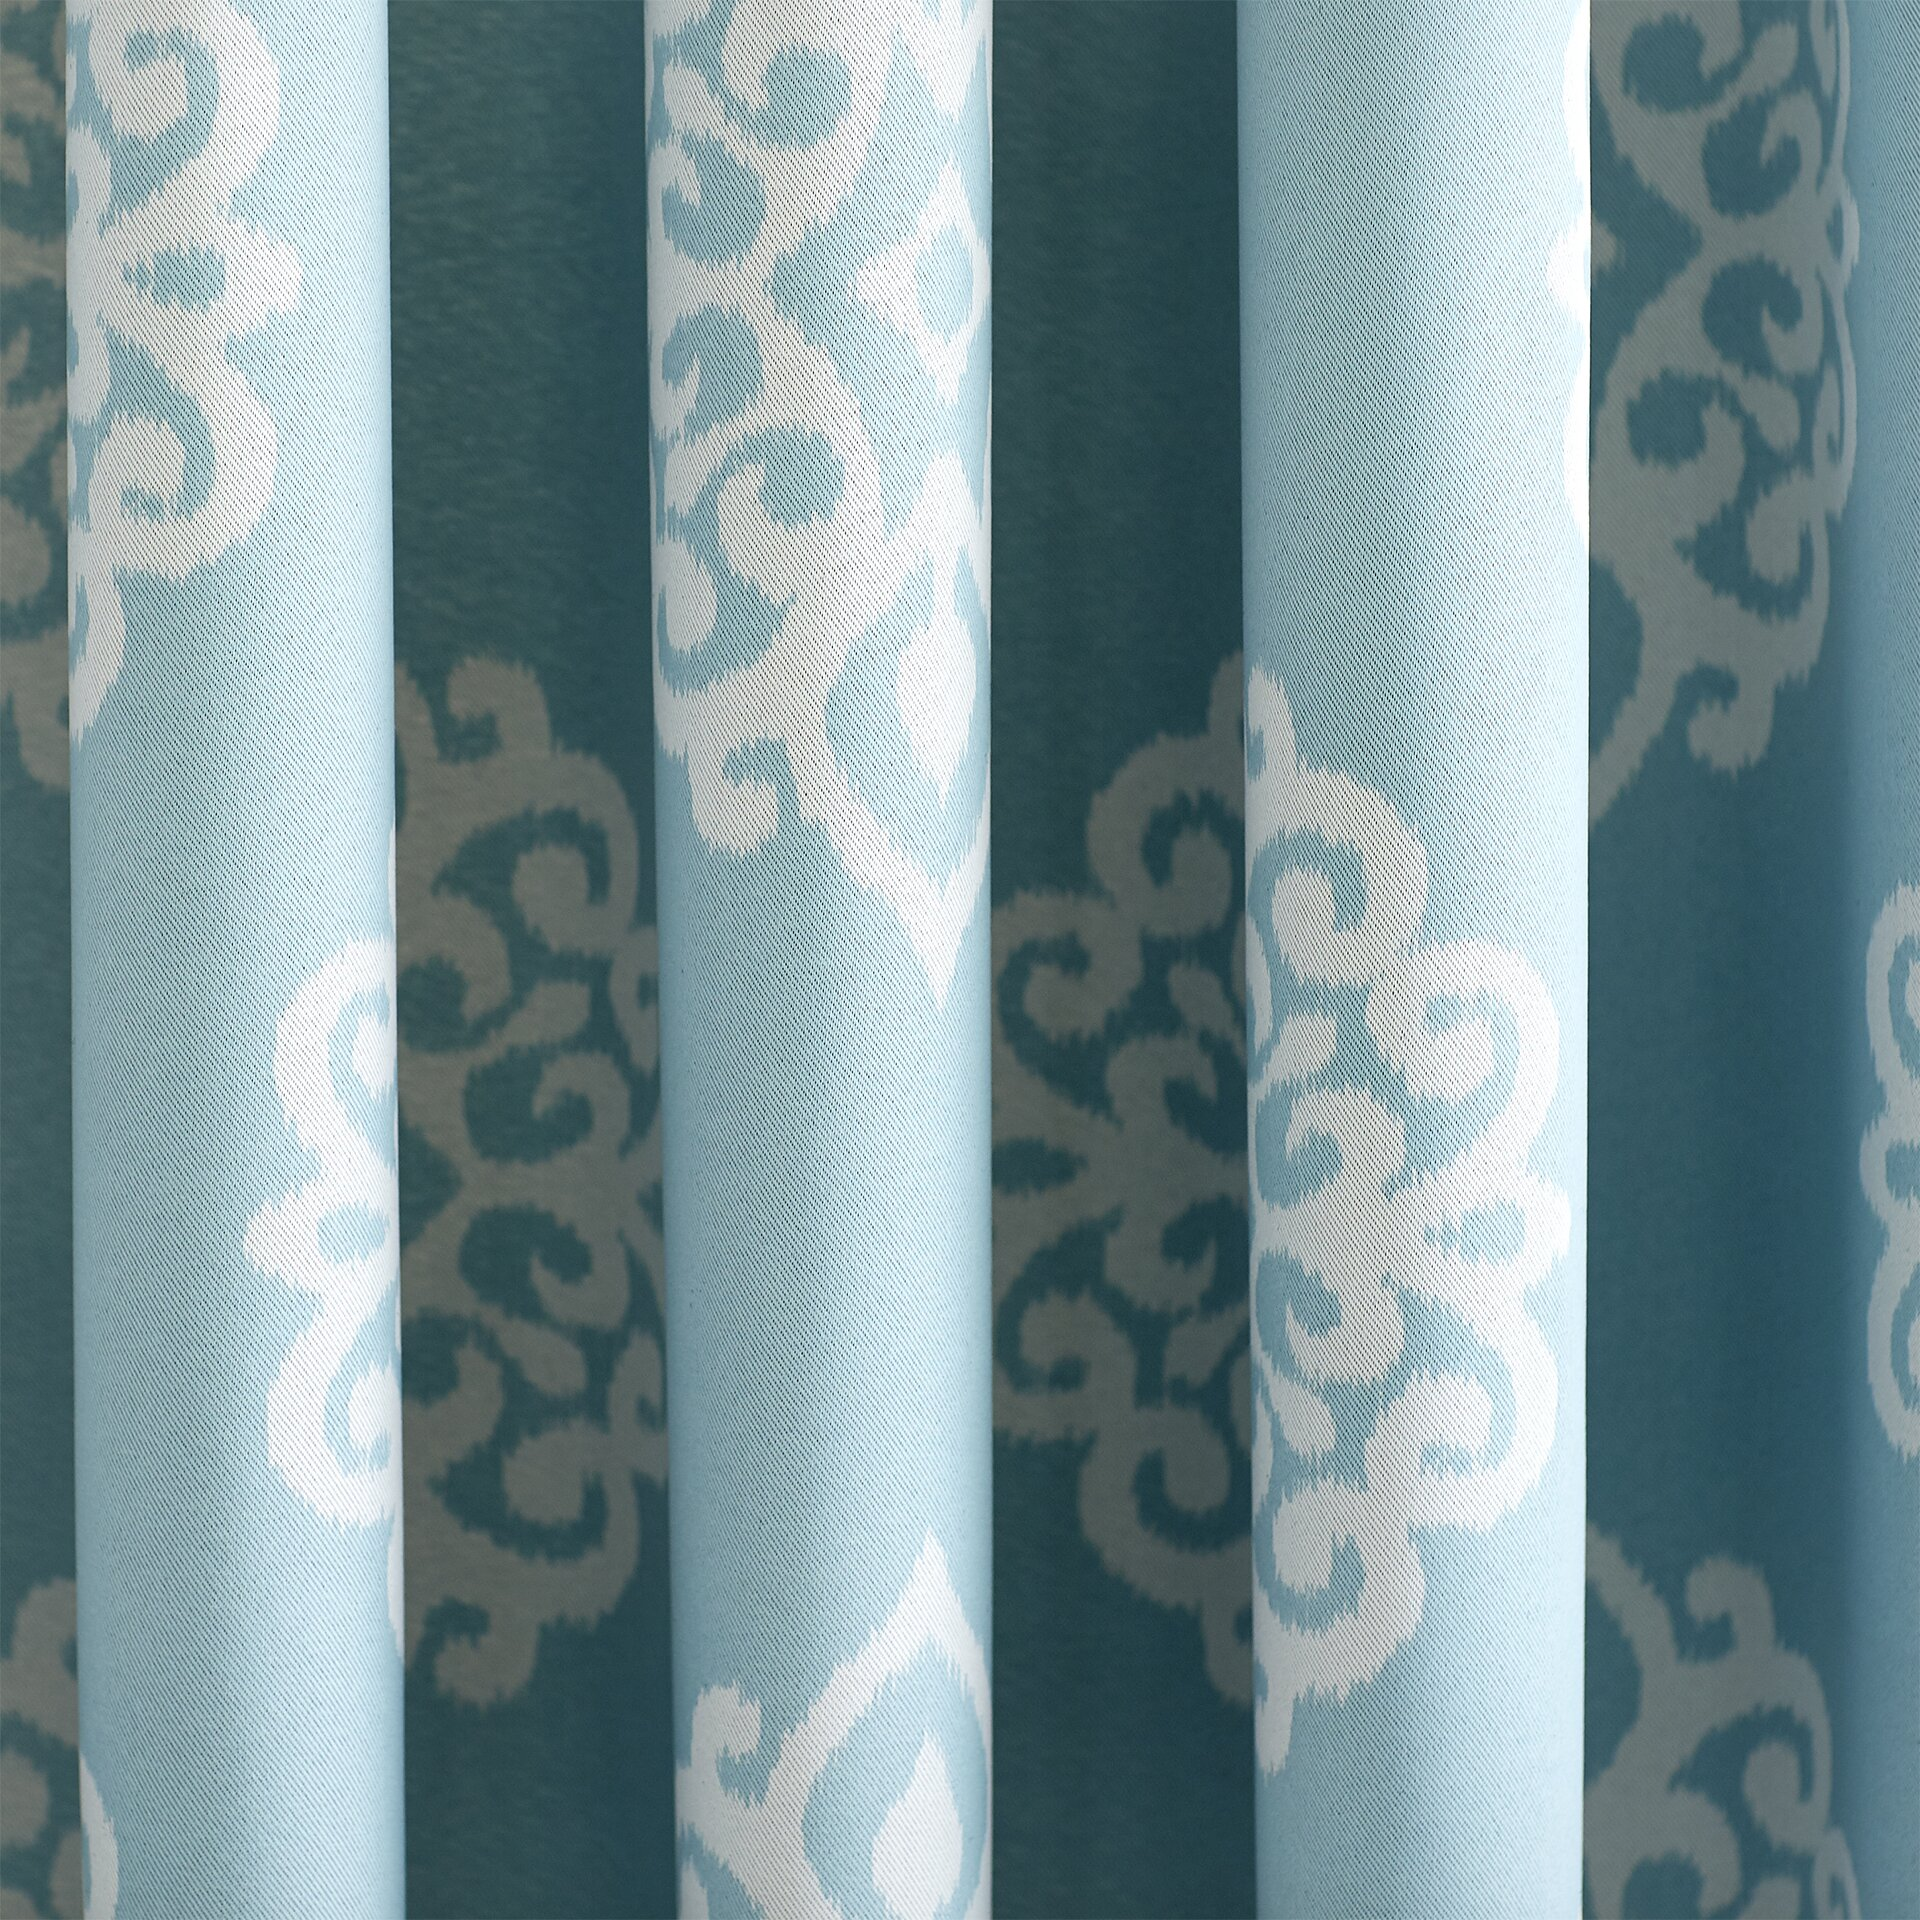 Aqua Curtain Panels - Oliver damask blackout thermal rod pocket curtain panels